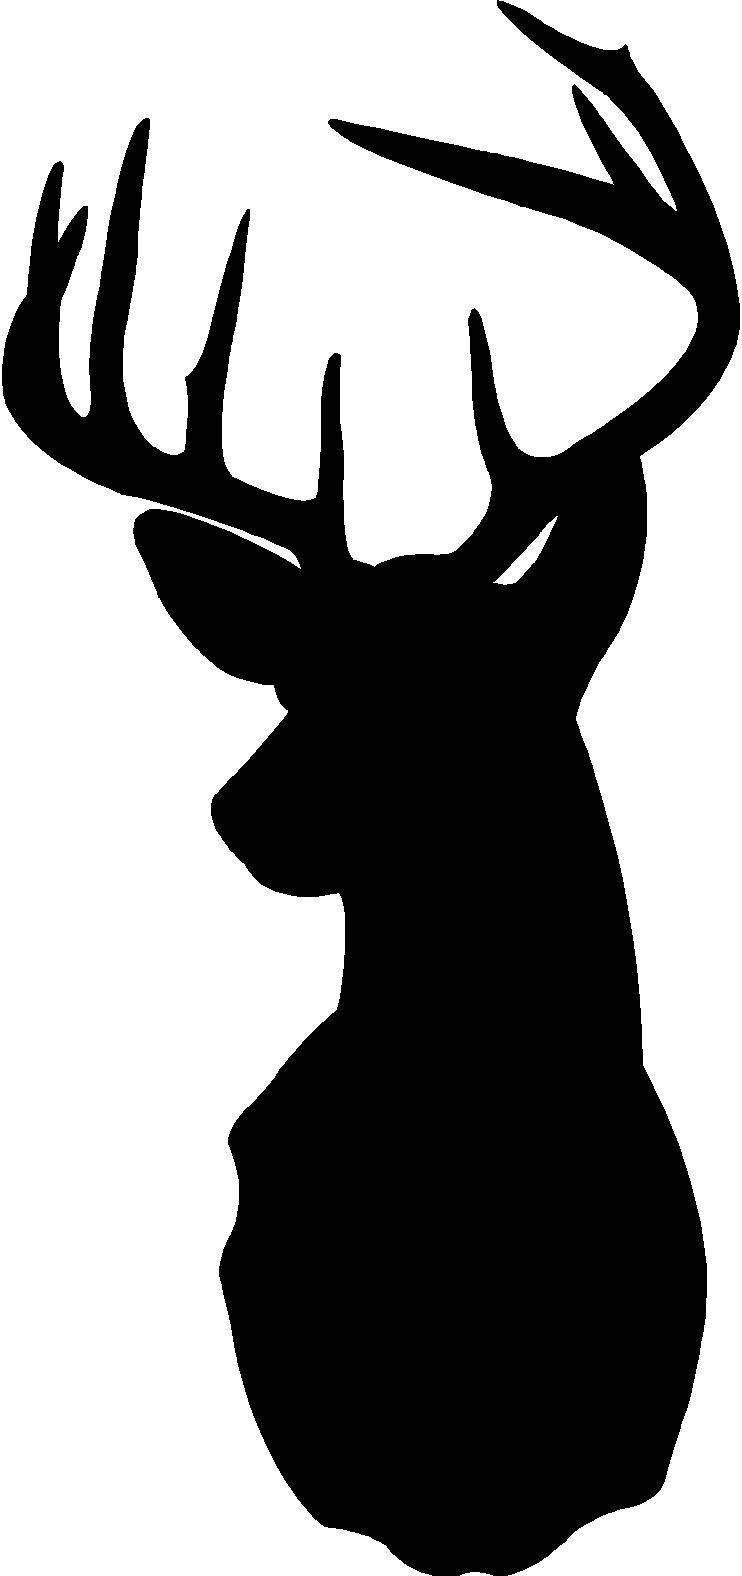 Buck clipart deer silhouette, Buck deer silhouette ...